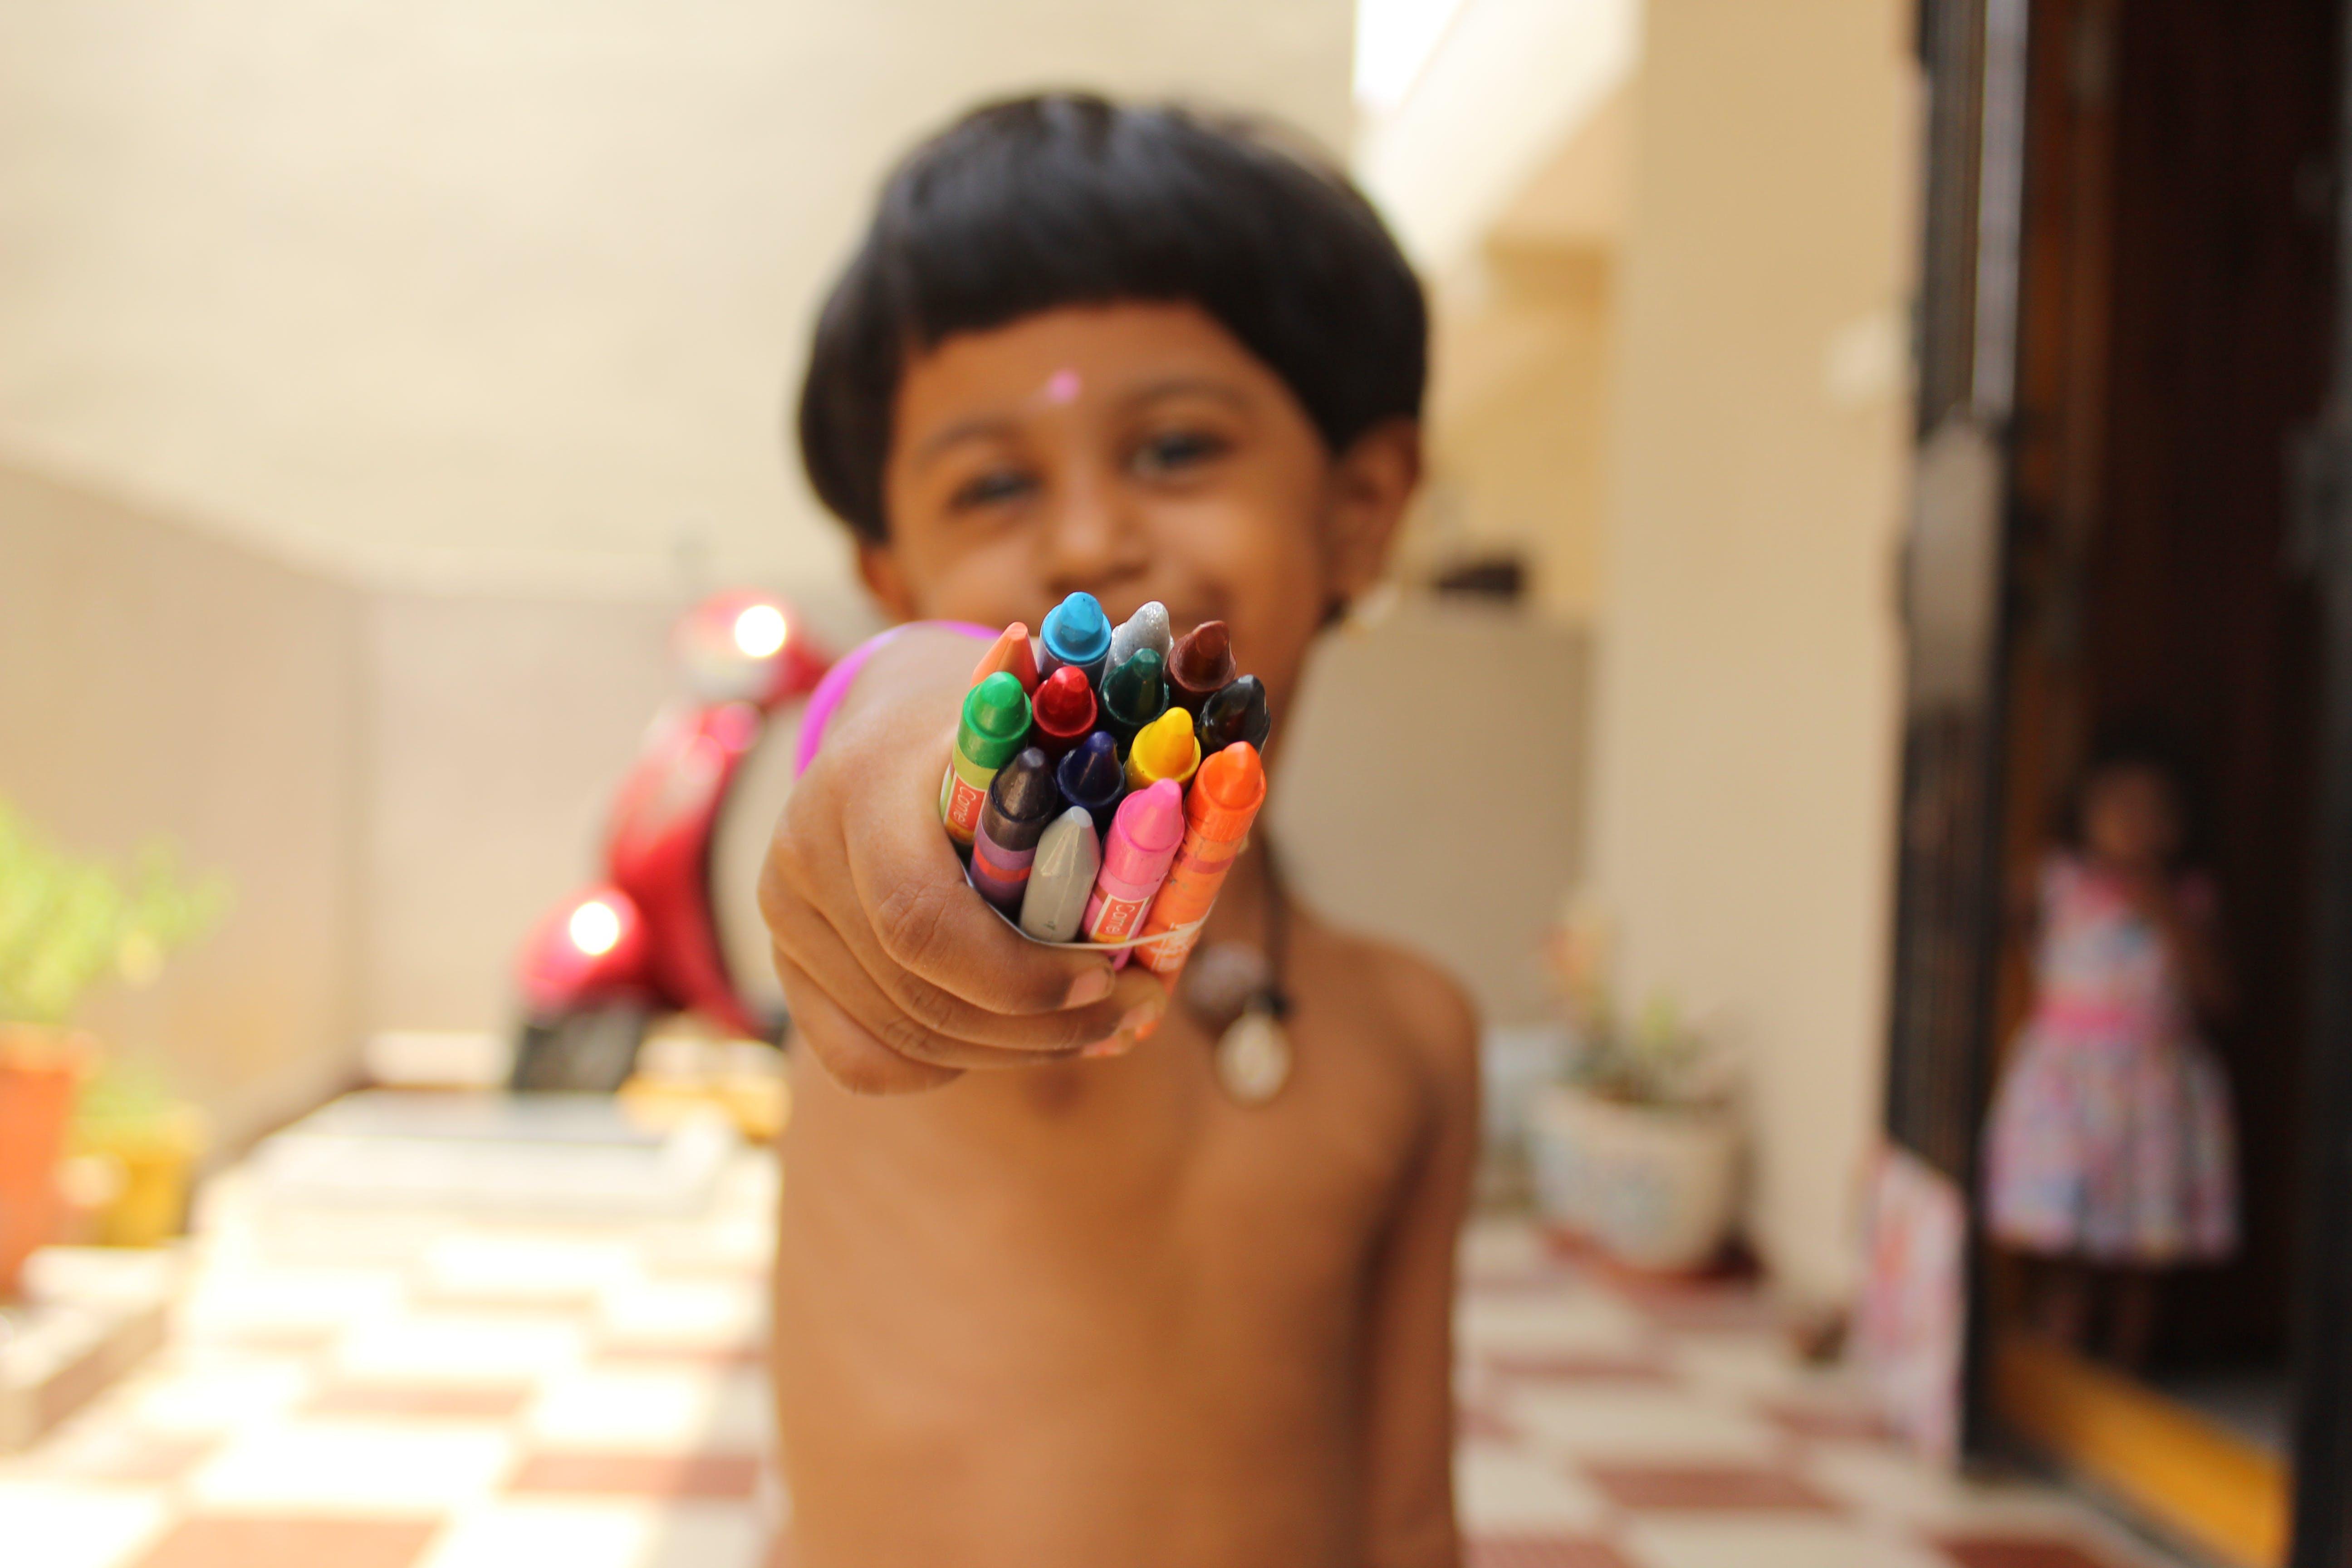 Boy Holding Crayons